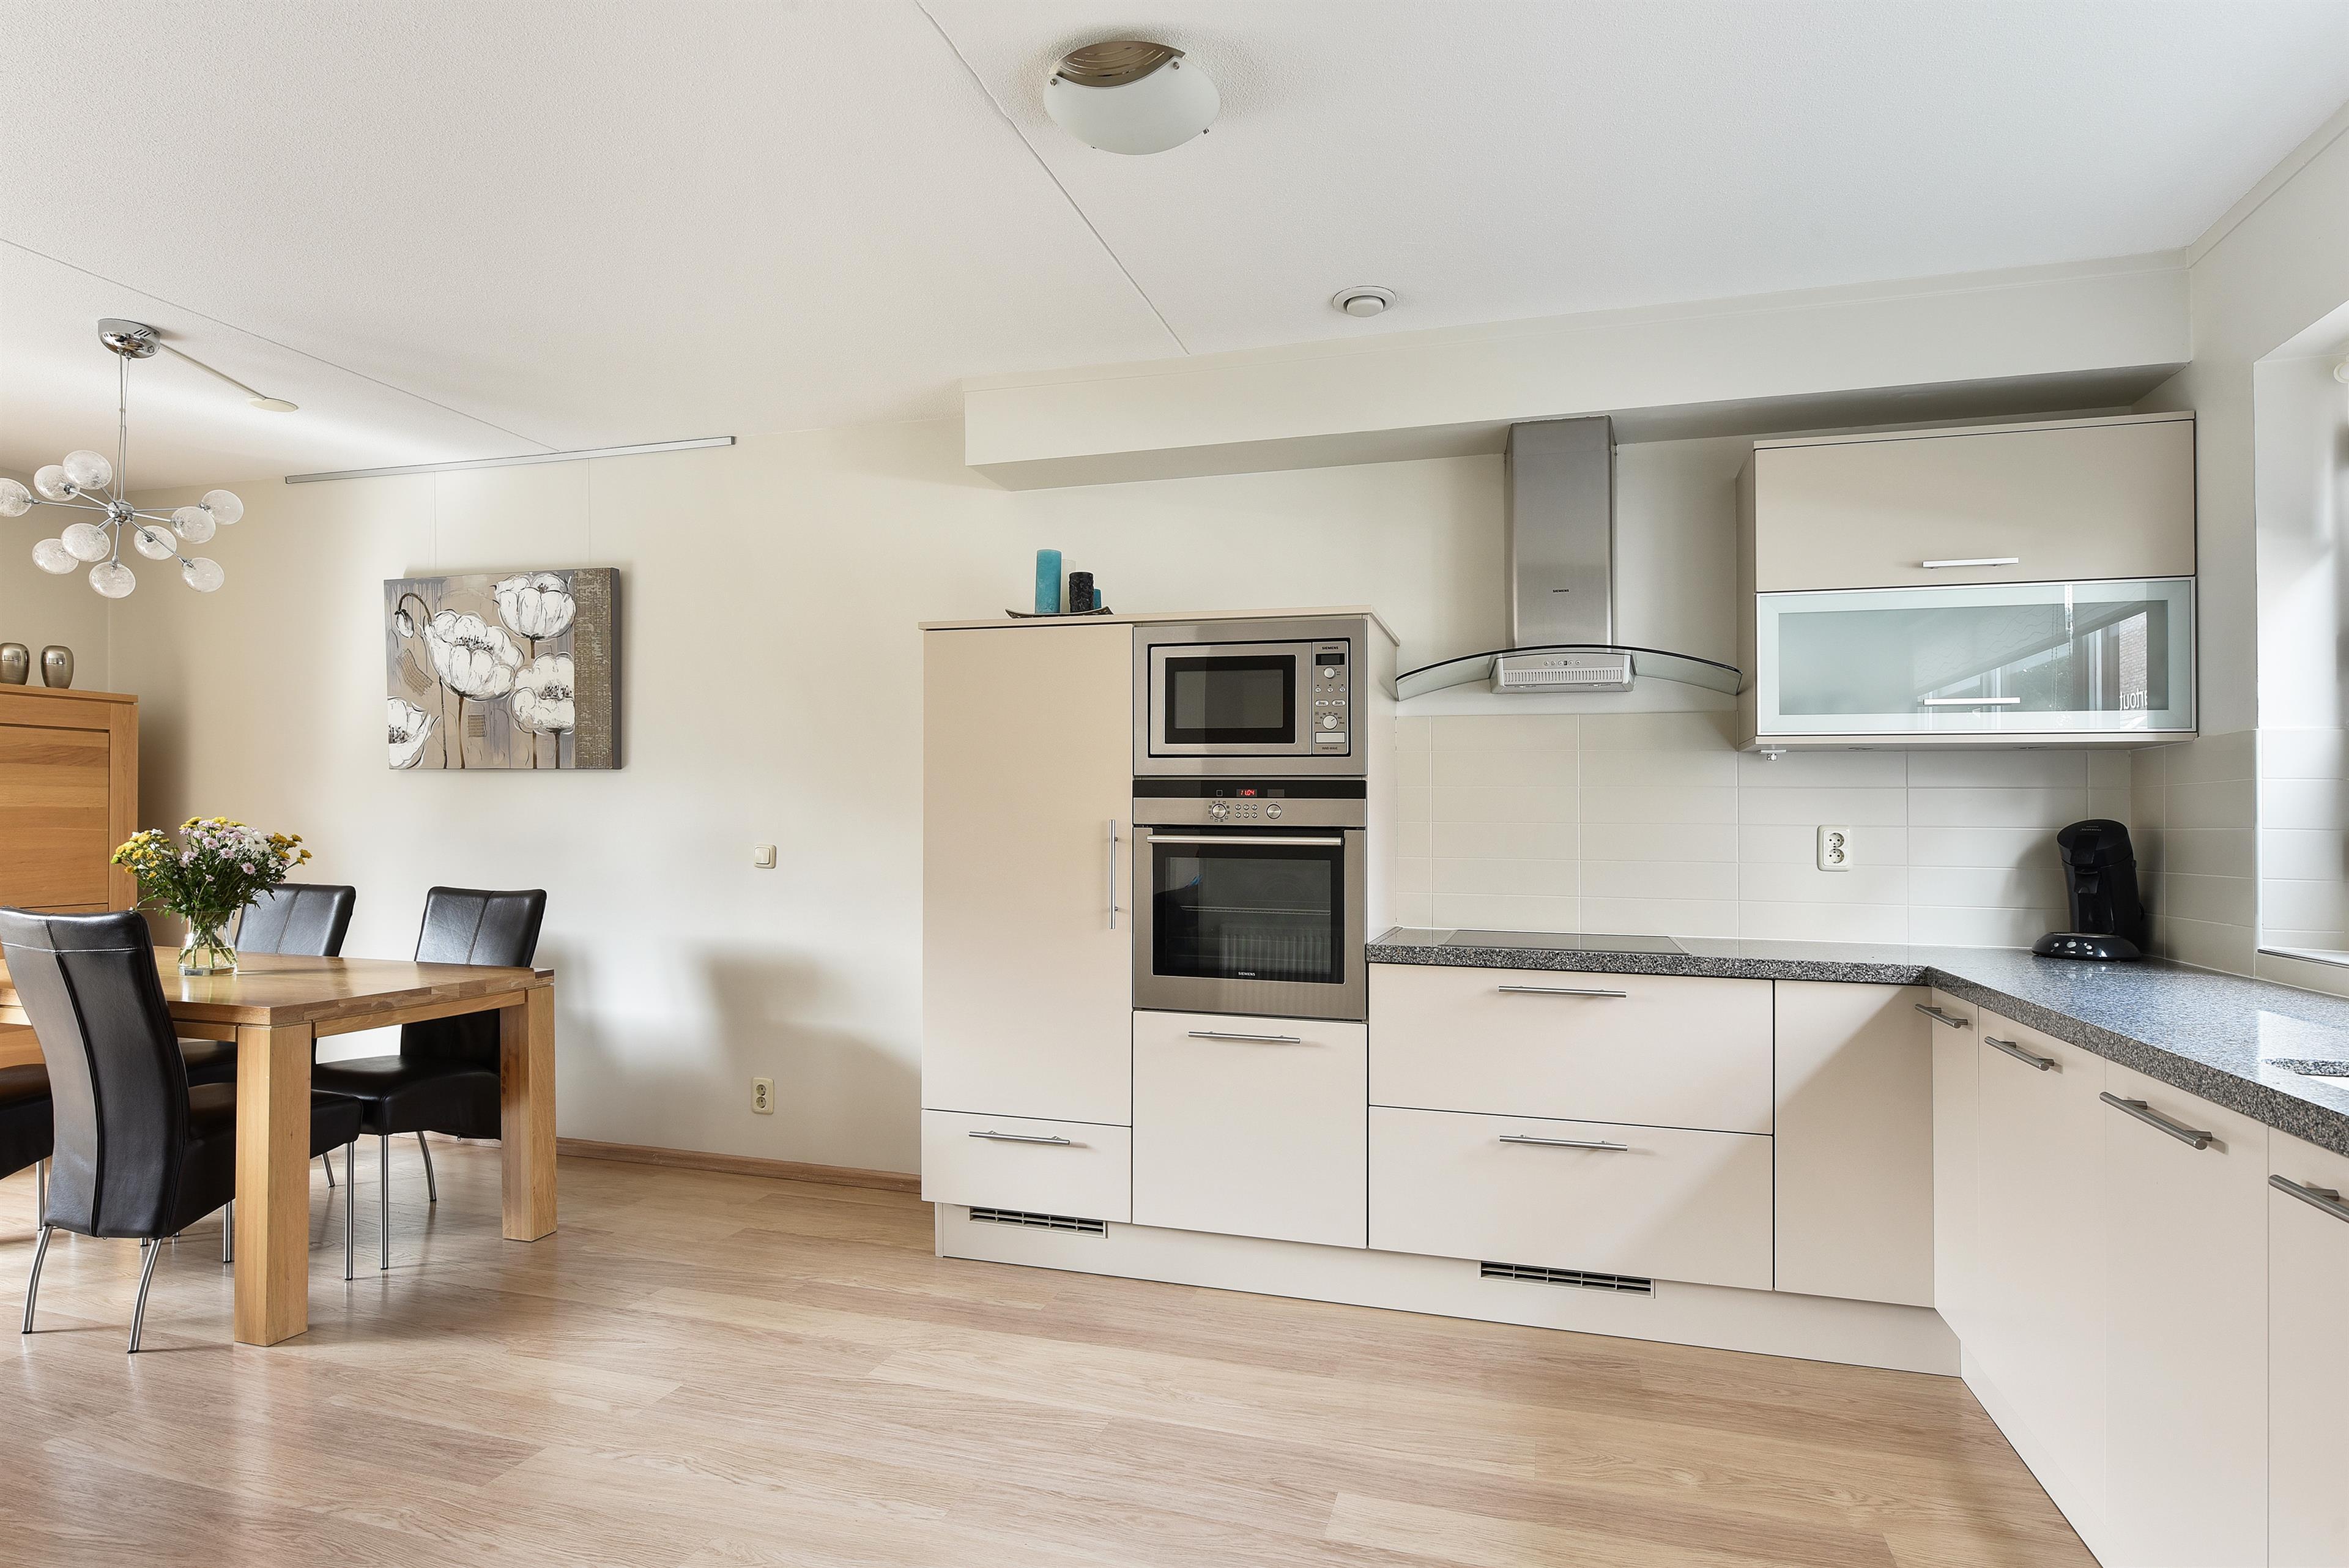 Keuken Badkamer Apeldoorn : Te koop lange grafte apeldoorn hendriks makelaardij